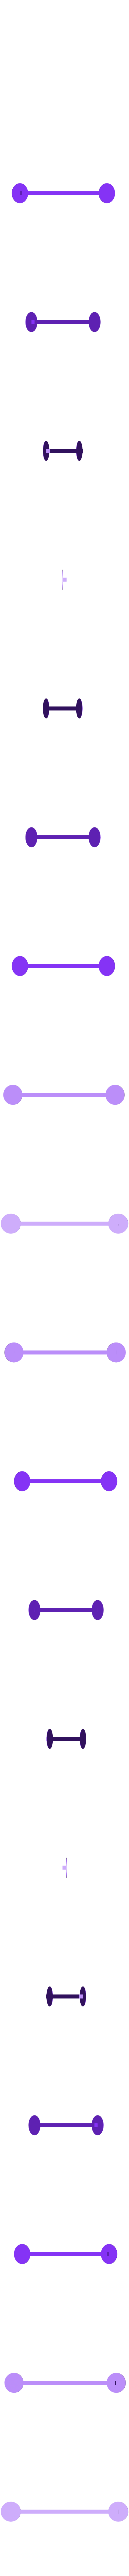 Axle_Main.stl Download free STL file Impatience, Motorized • 3D printer object, gzumwalt